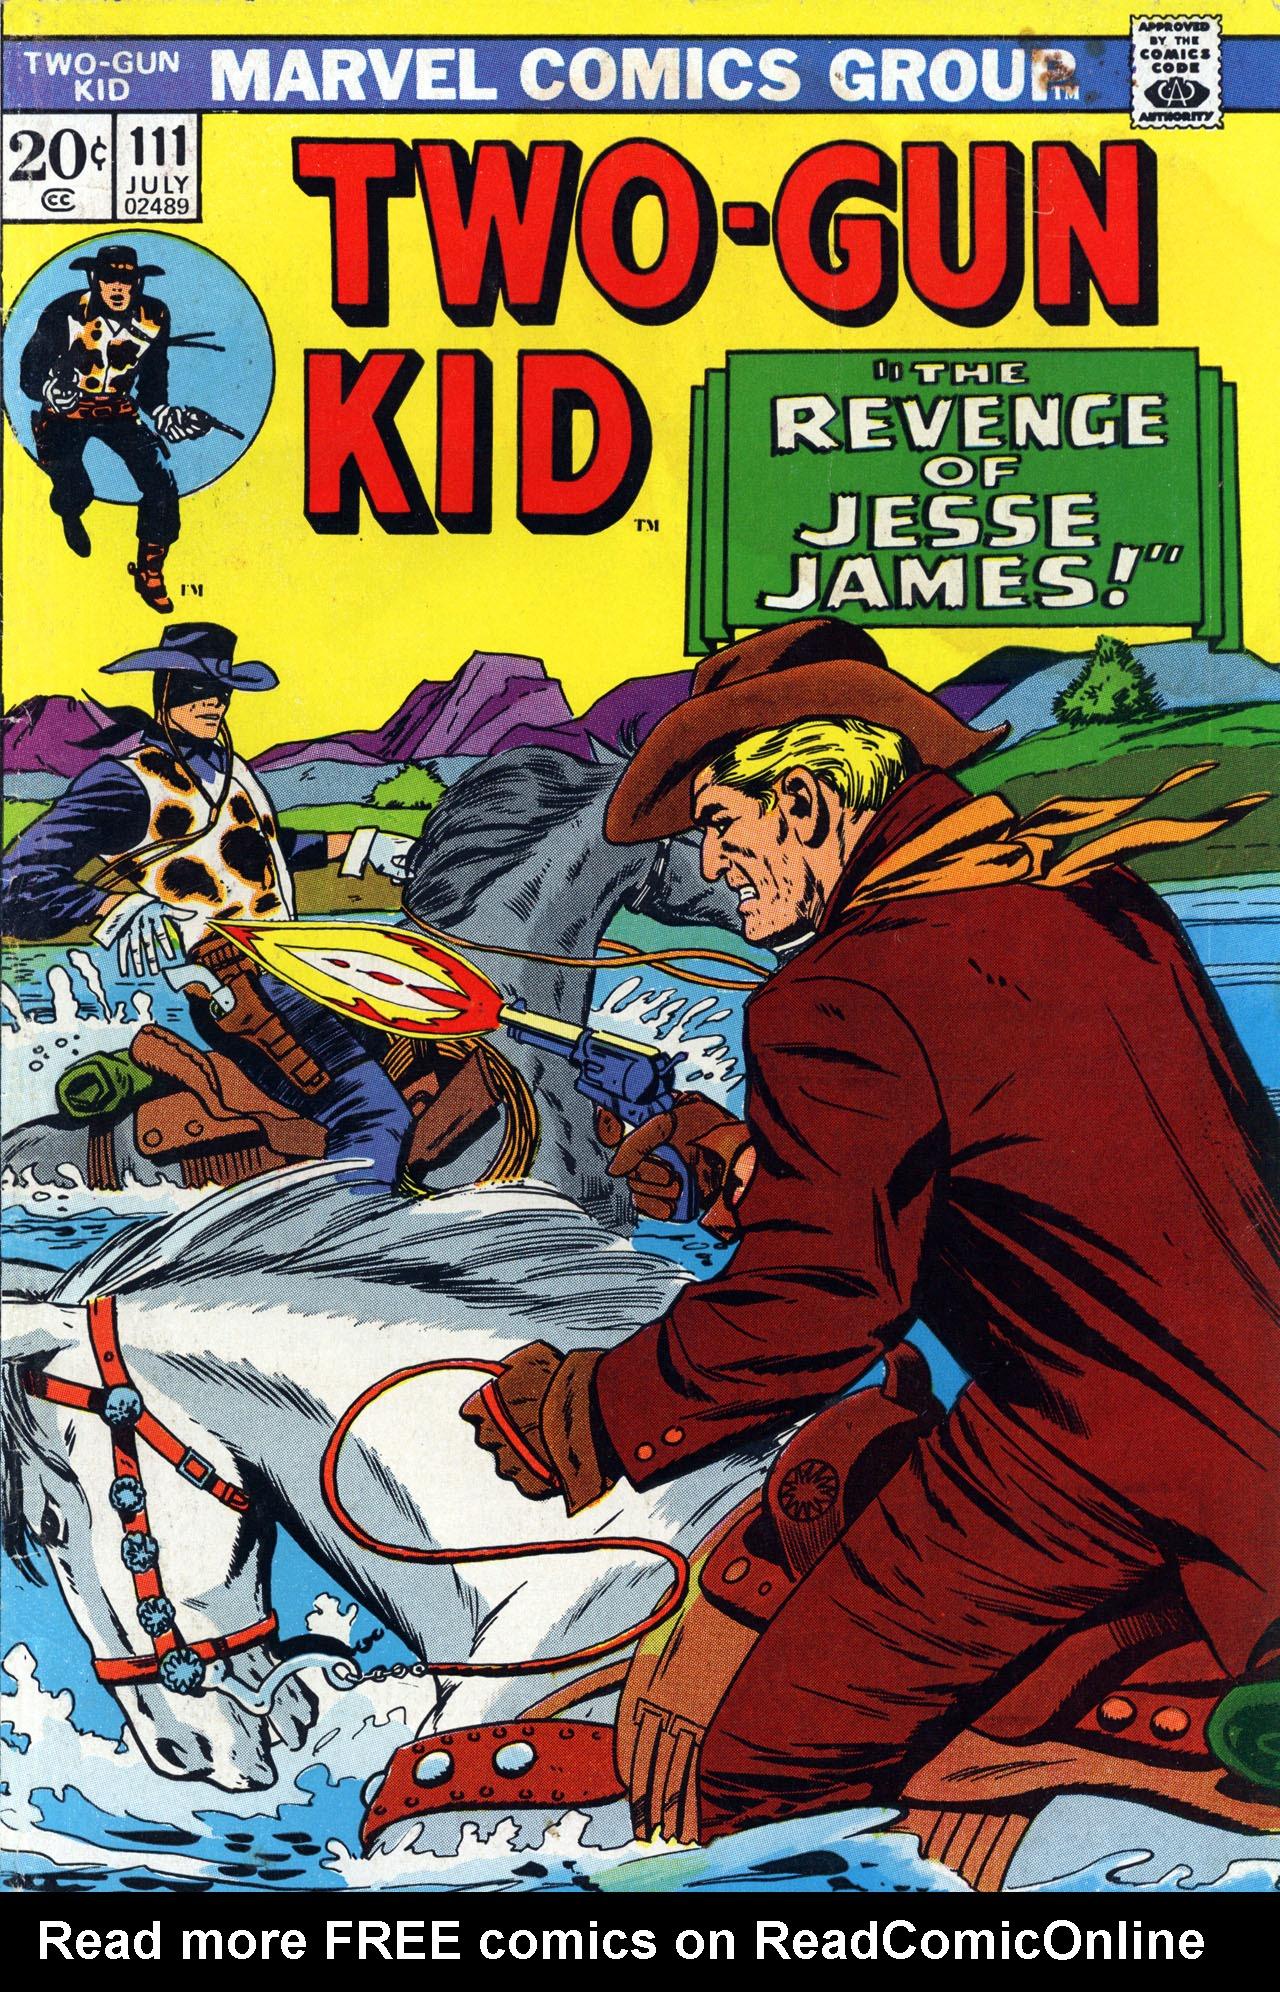 Read online Two-Gun Kid comic -  Issue #111 - 1